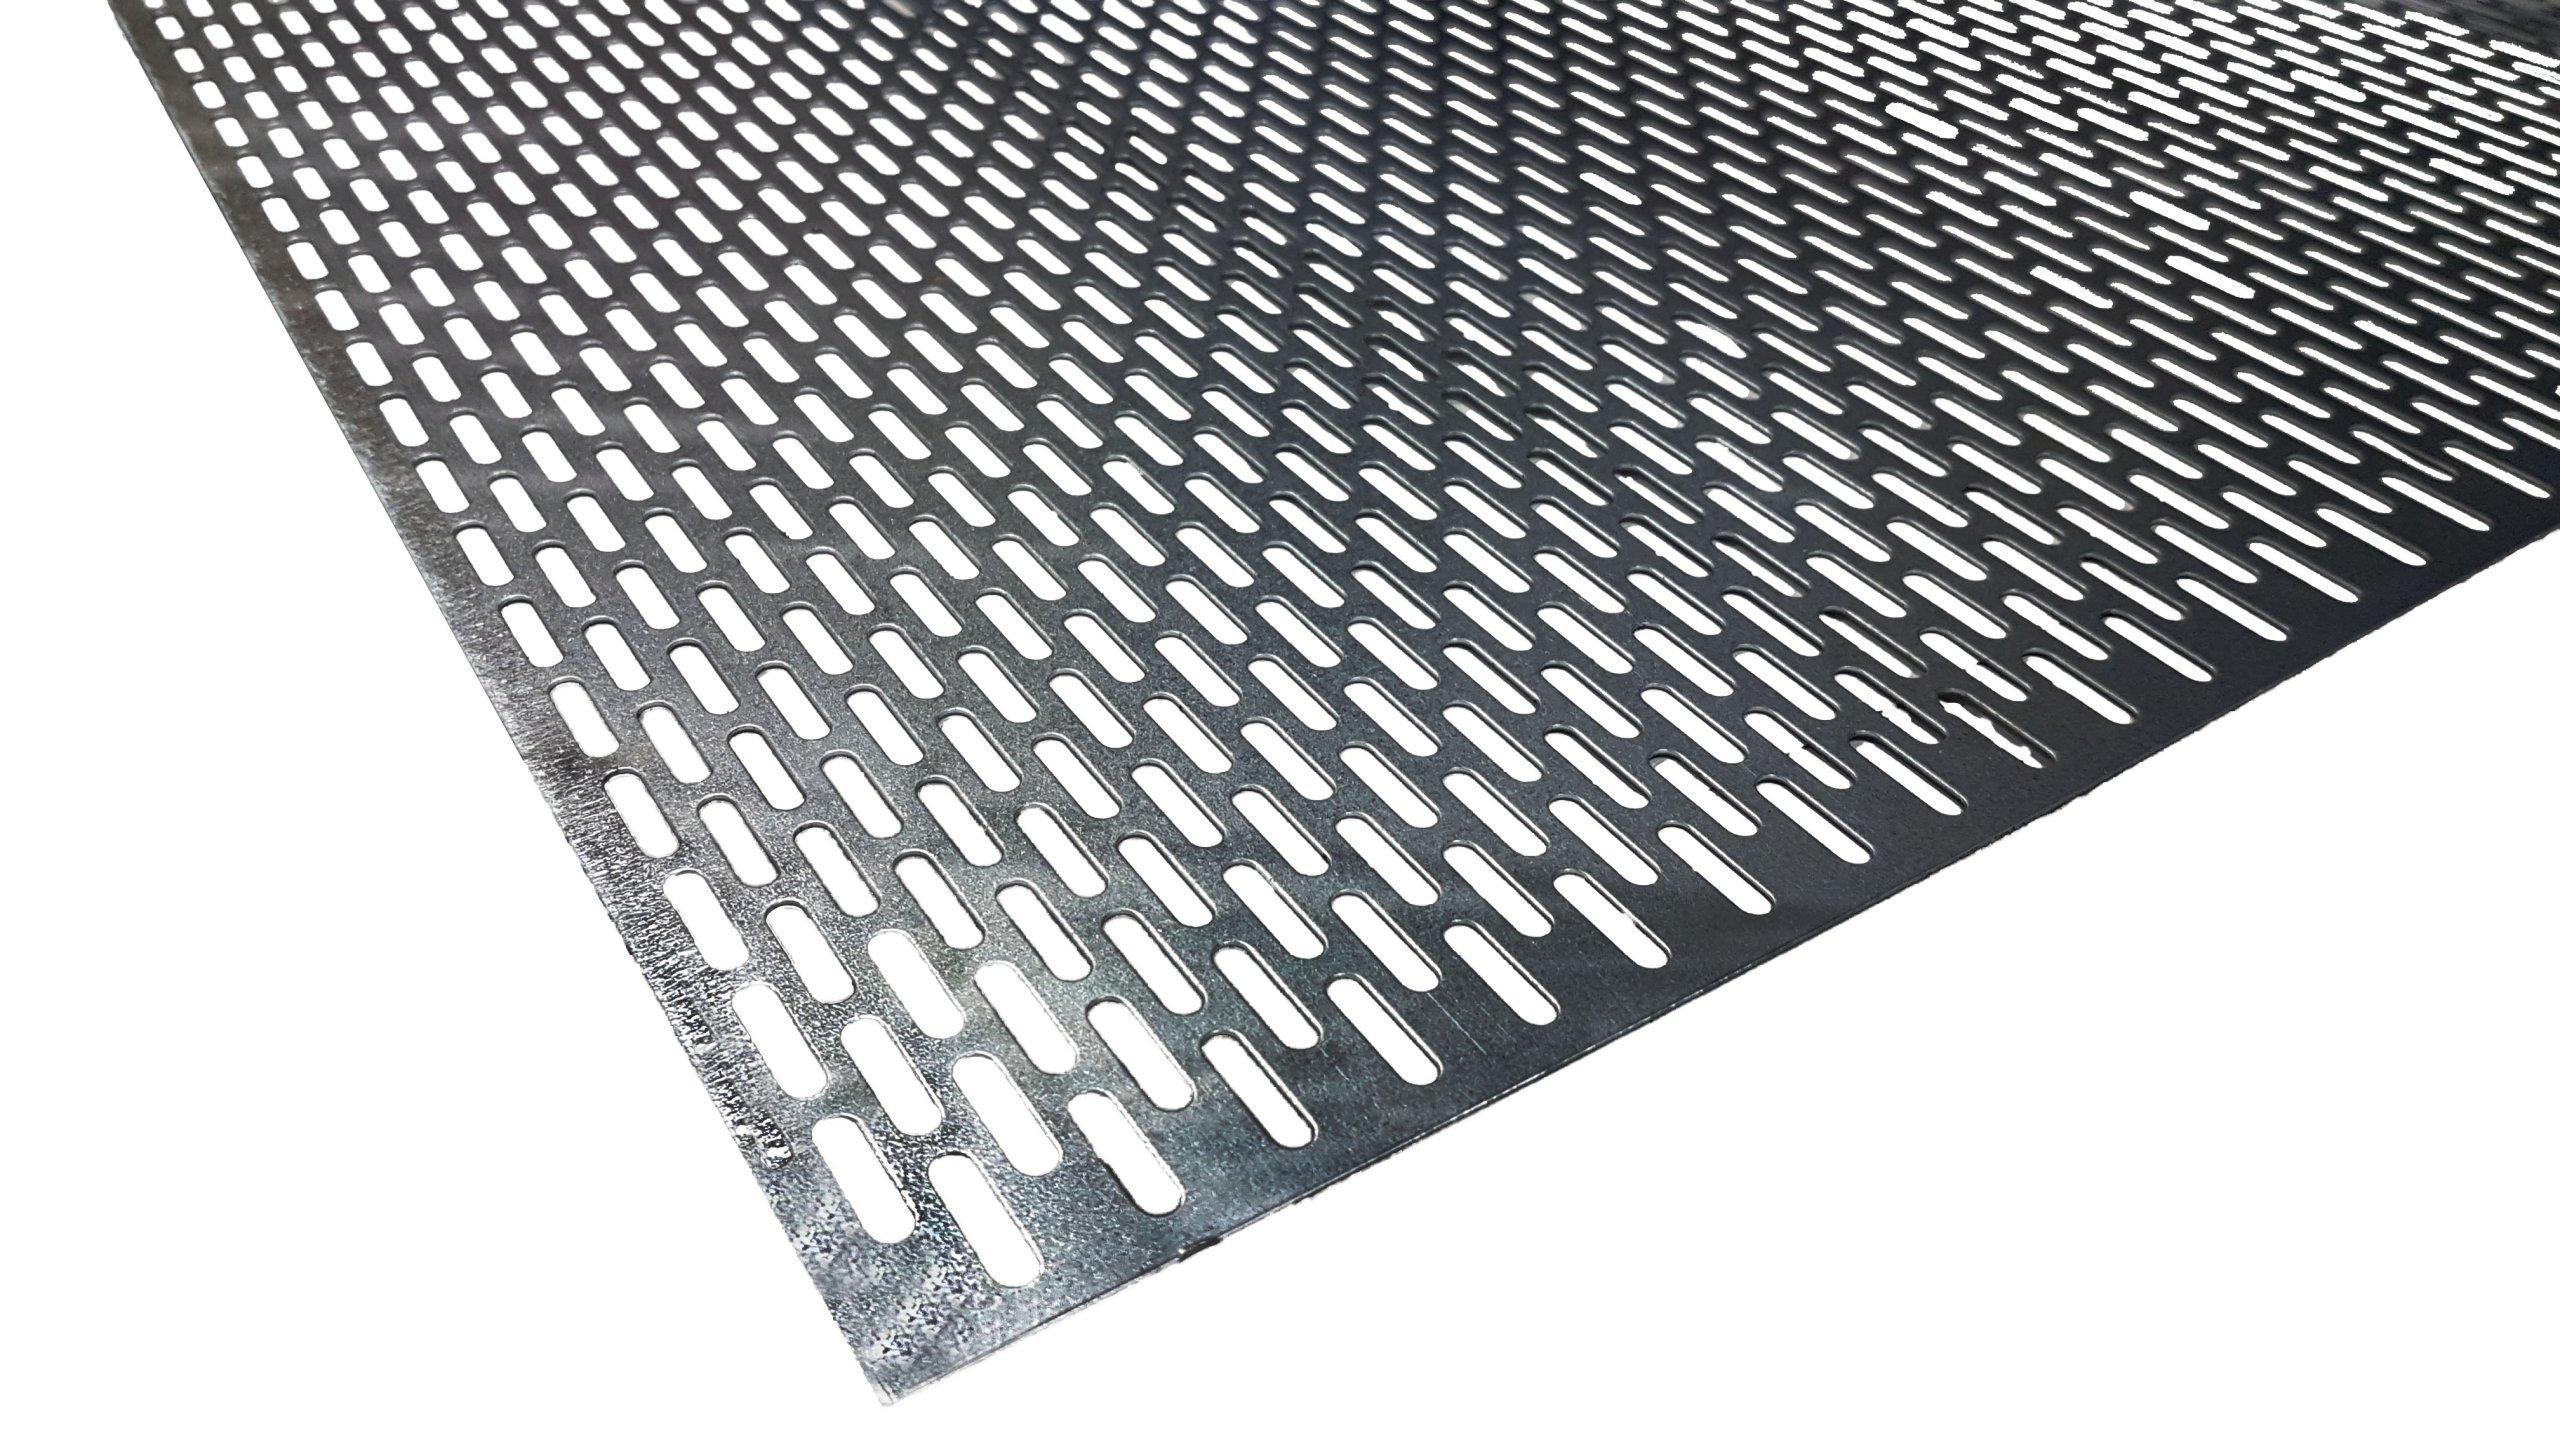 BLACHA PERFOROWANA 1000 x 2000 OCYNK 1 mm Lvl 5-20